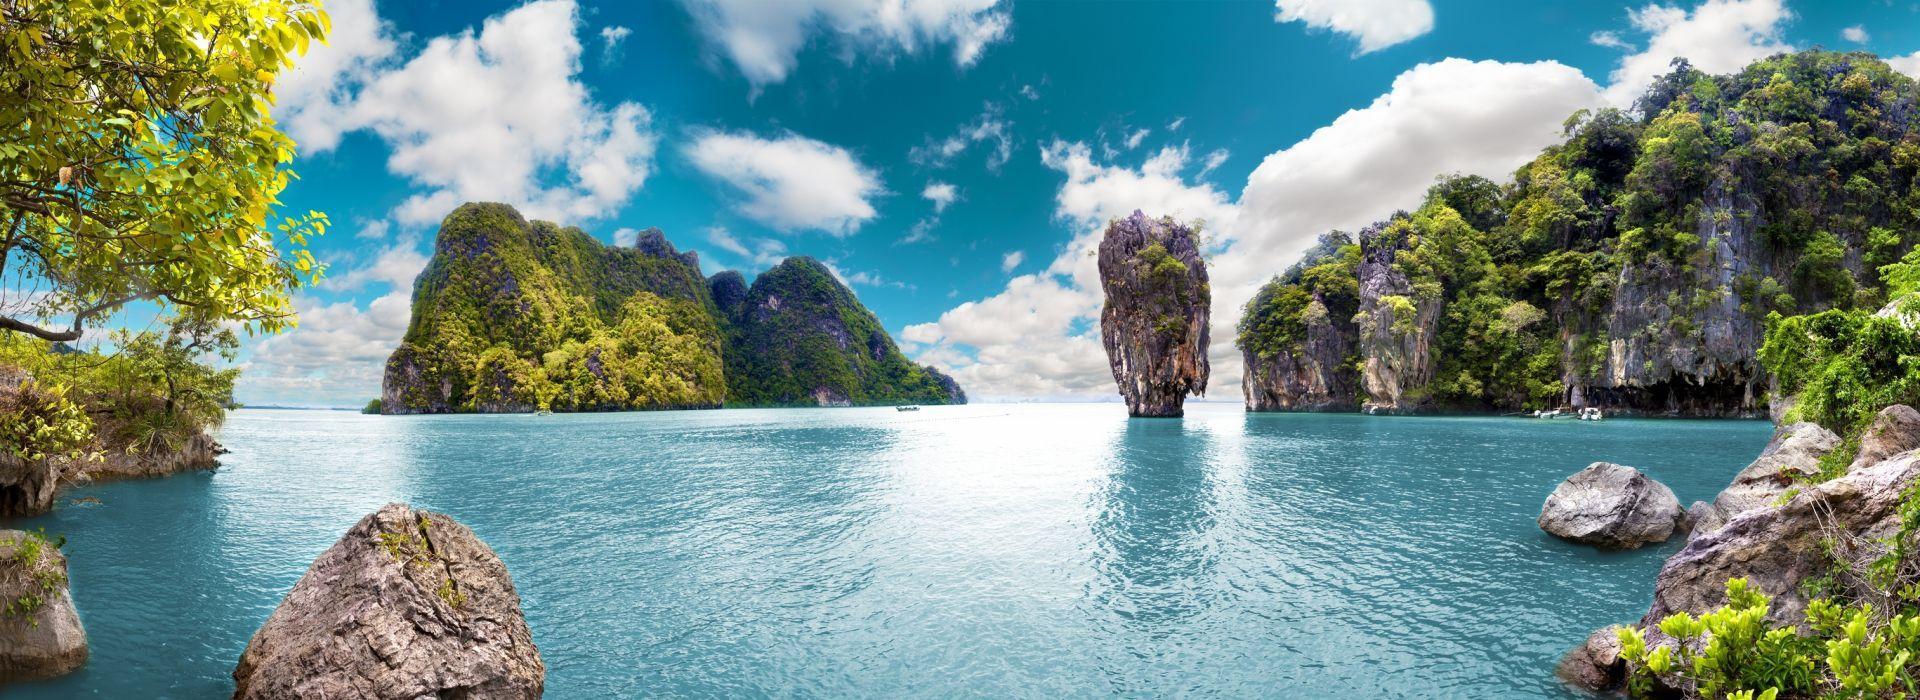 Beaches Tours in Thailand